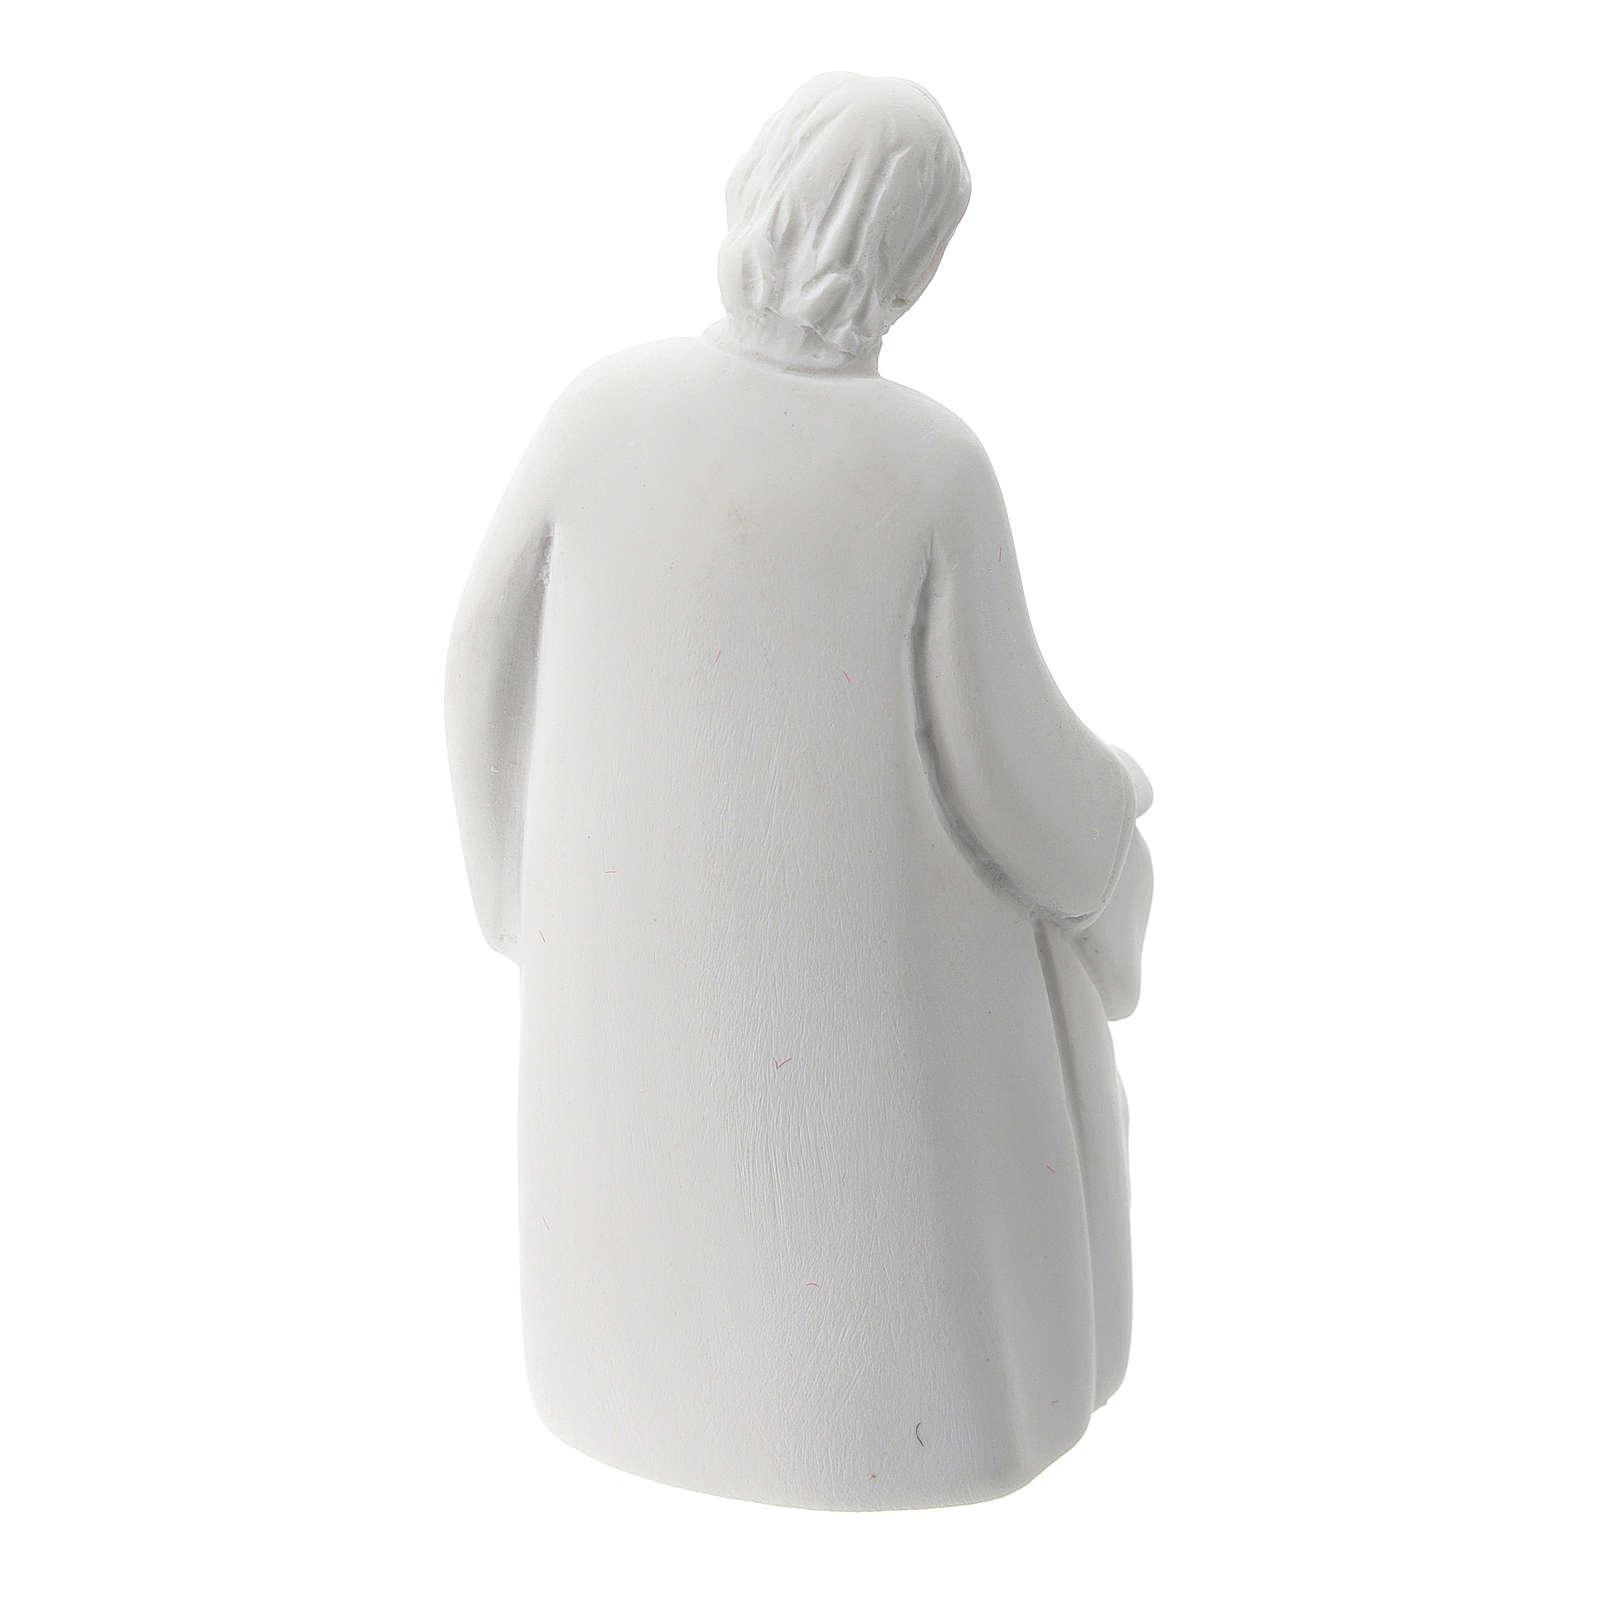 Sagrada Familia estilo clásico resina blanca 5 cm 3